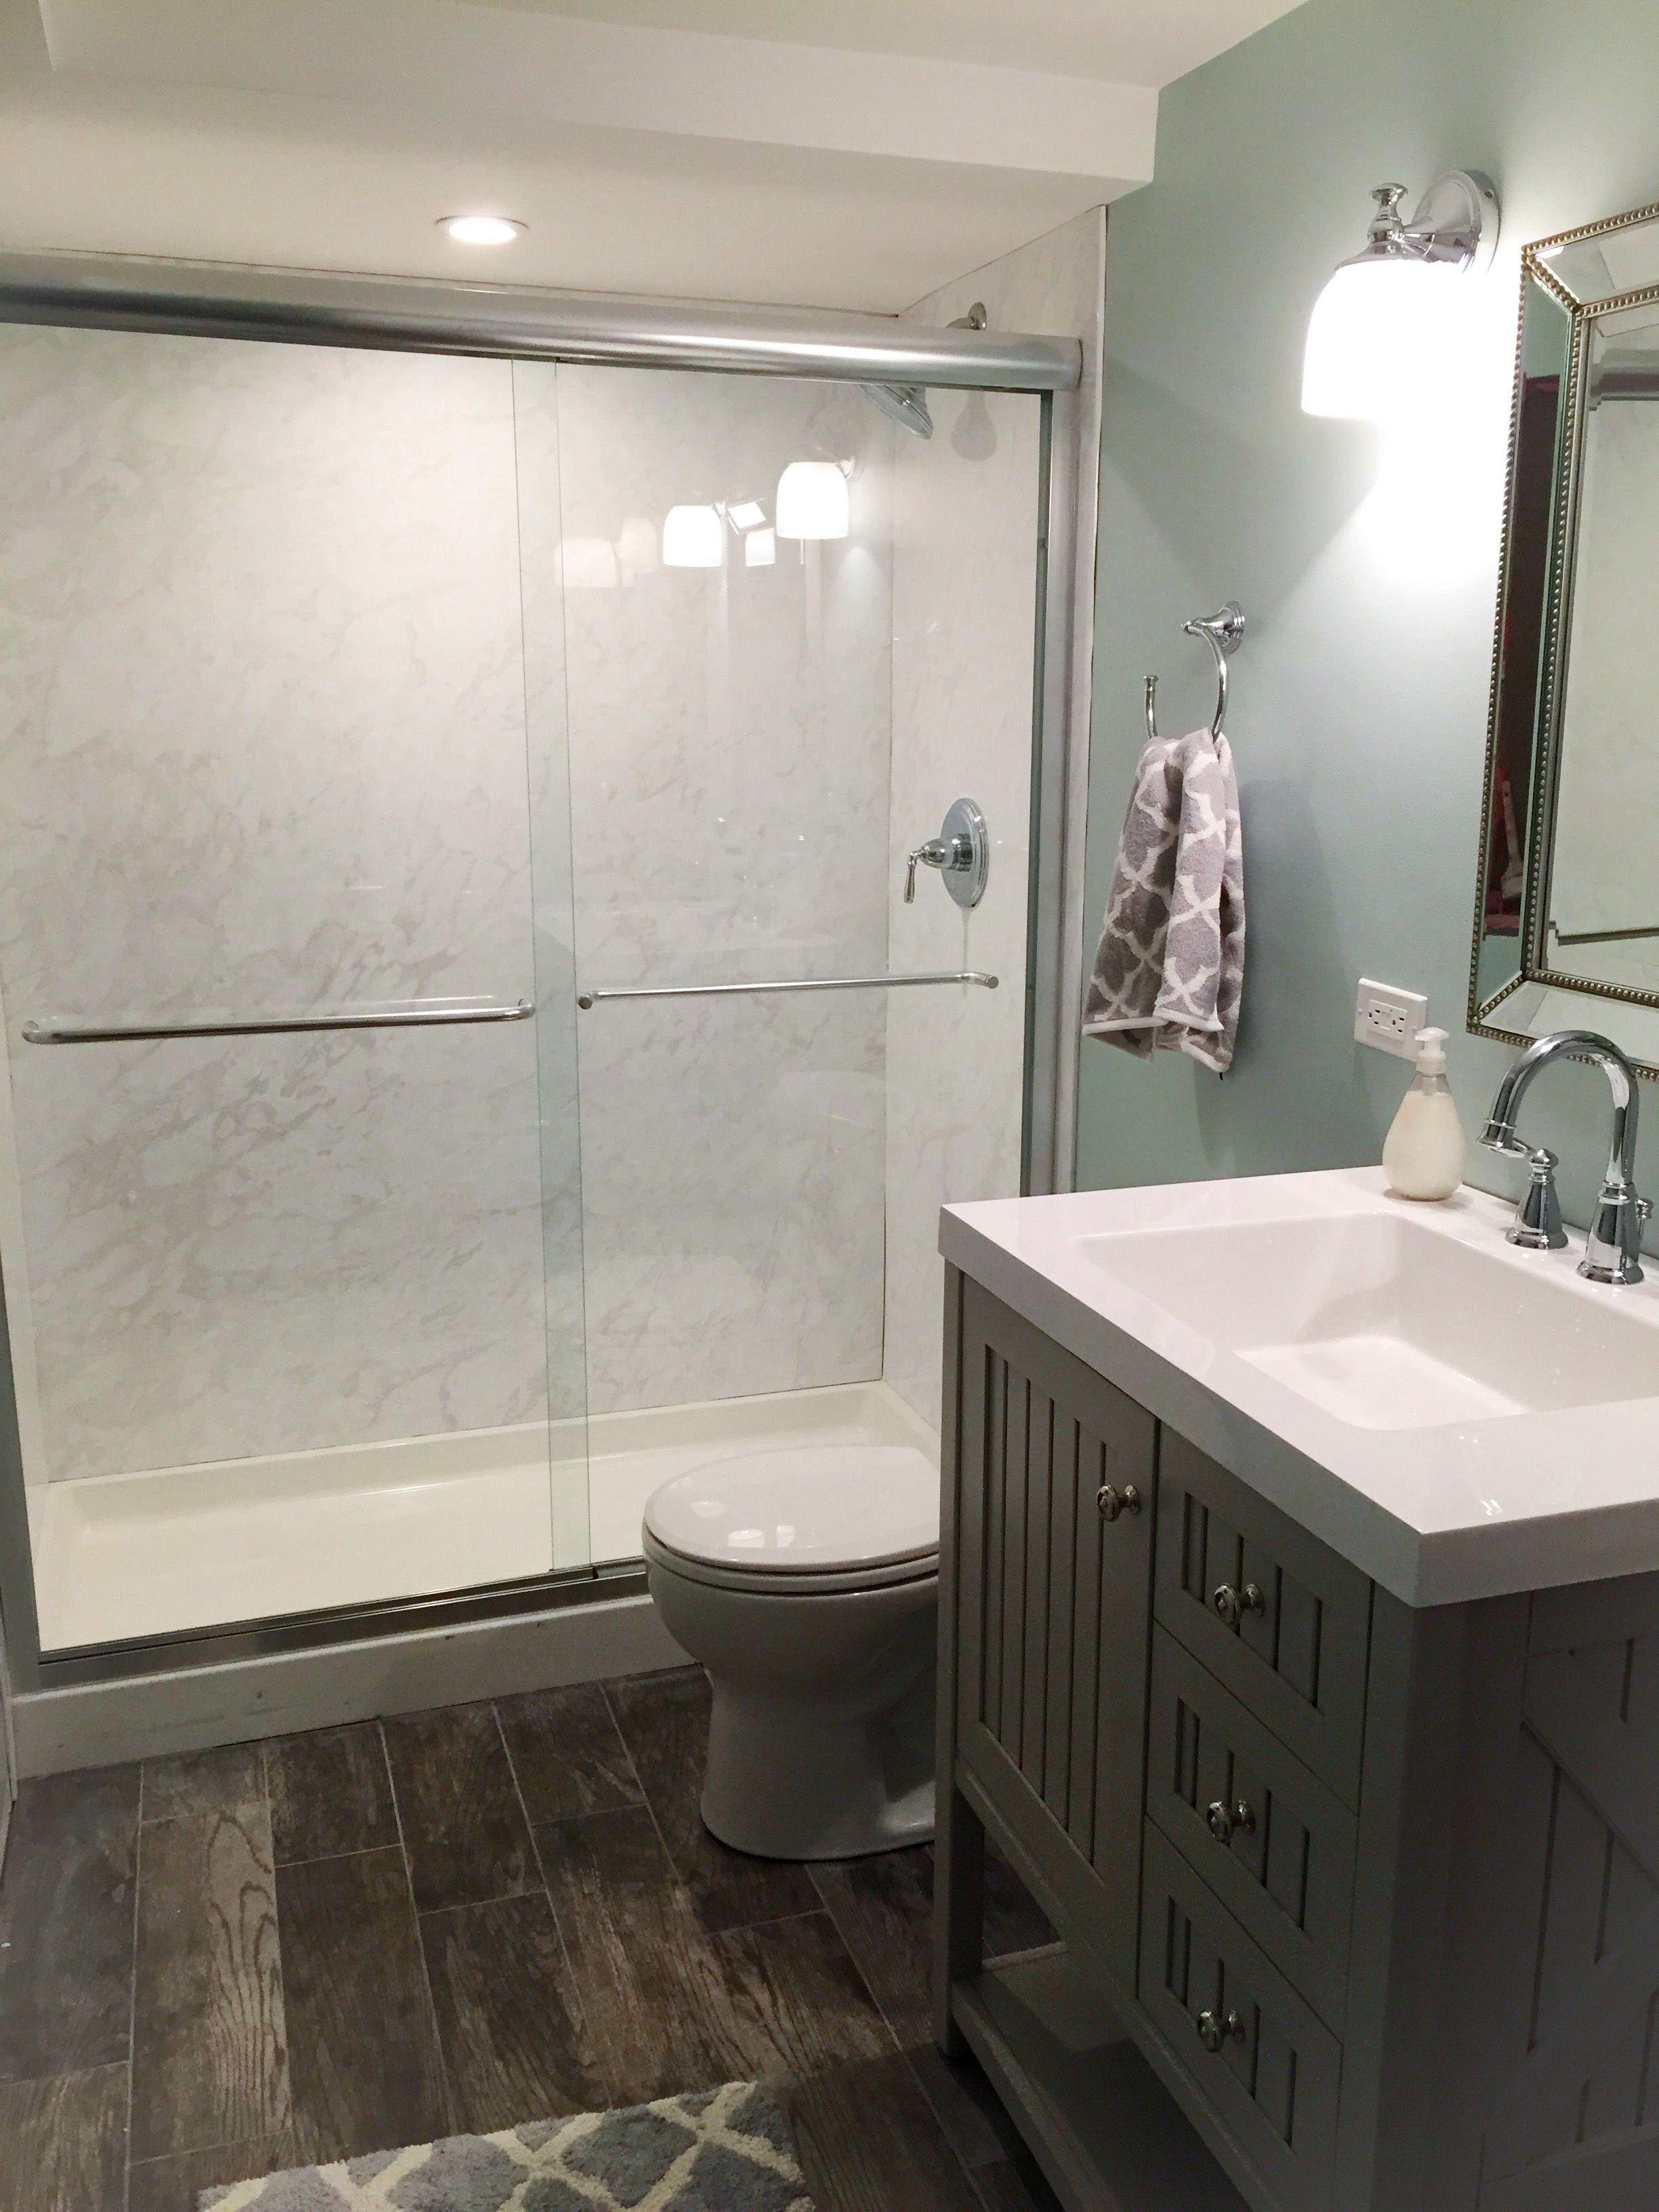 Amazing Small Bathroom Ideas Pinterest Visit Full Bathroom Remodel Small Full Bathroom Basement Bathroom Design